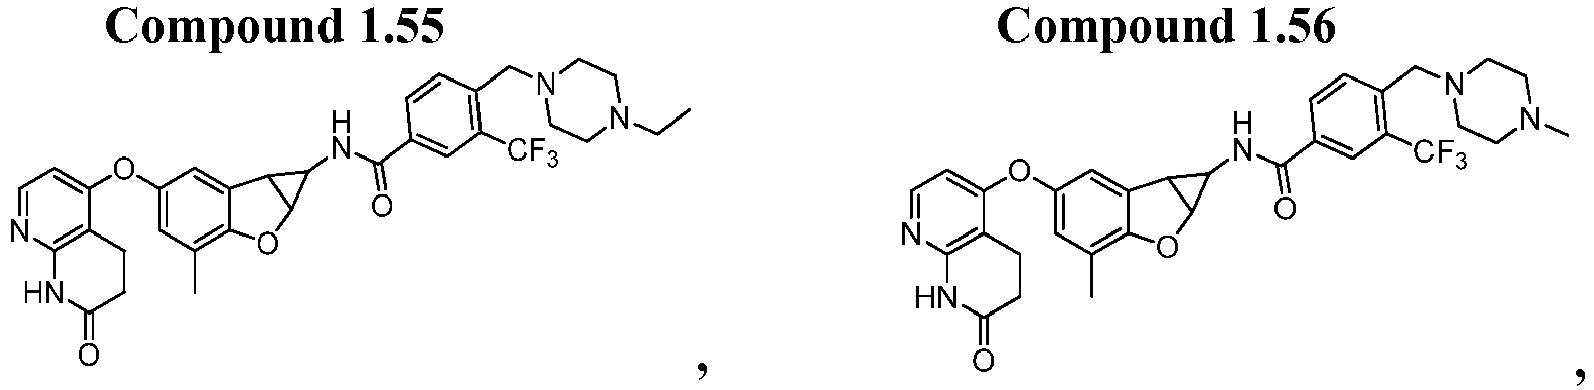 Figure imgb0379